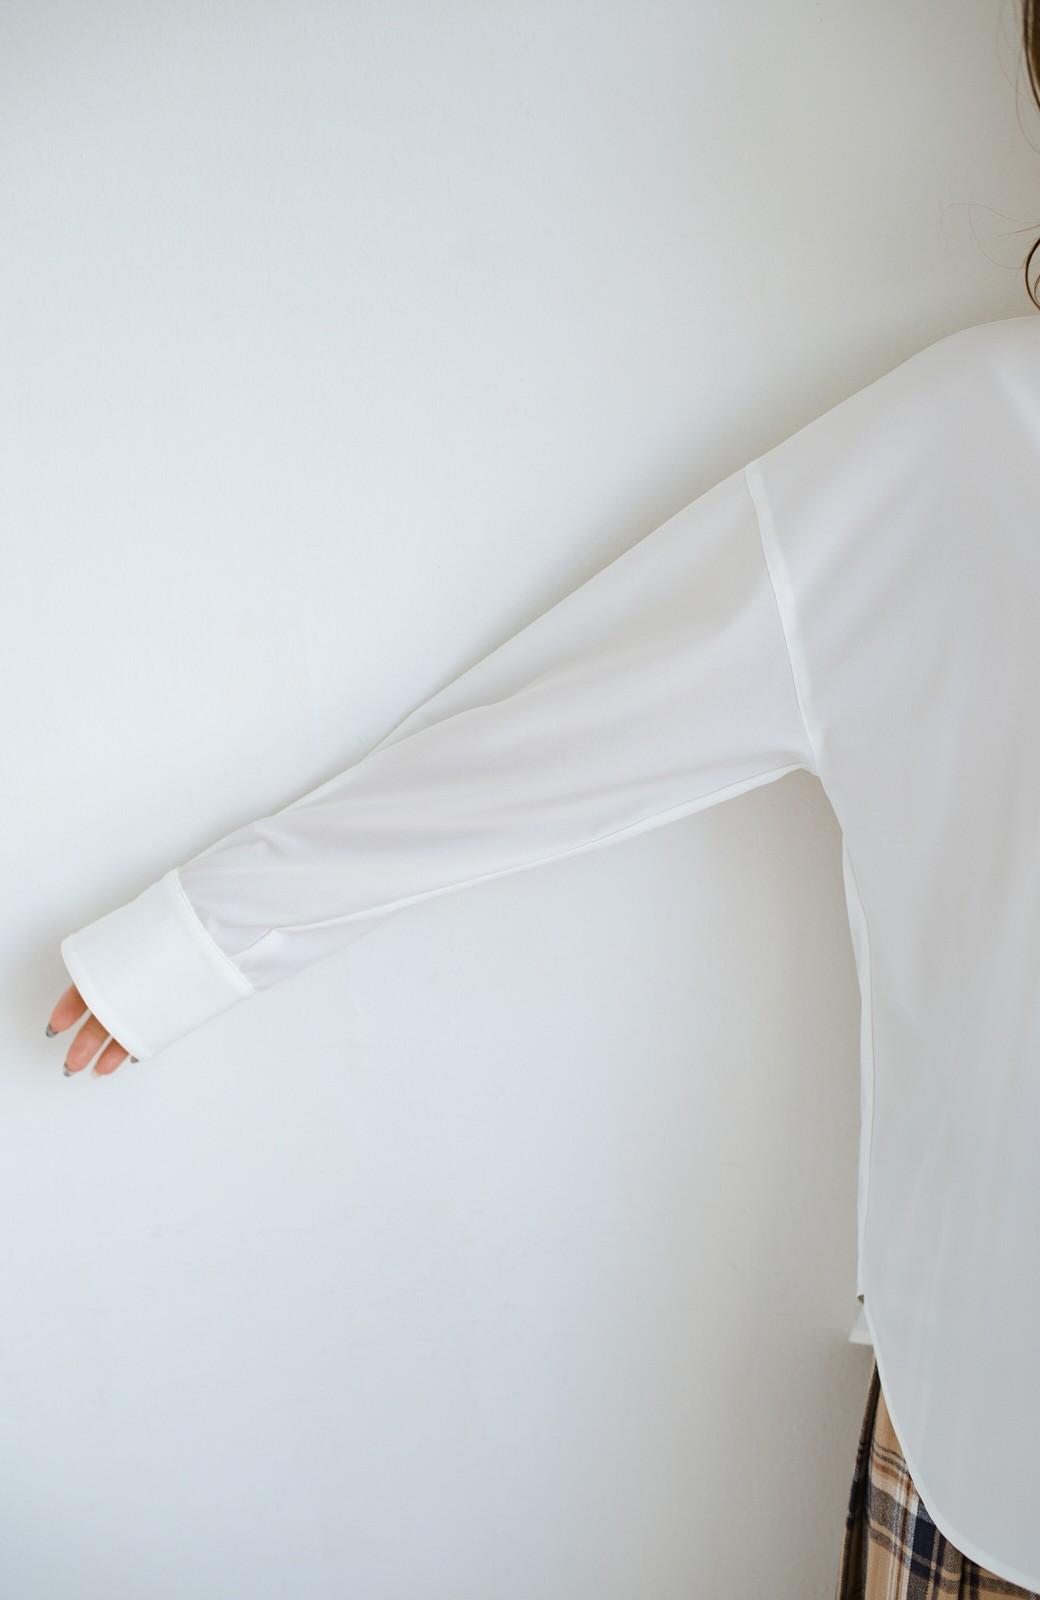 haco! 【肩幅党】肩幅広めがなんのその!華奢見せをとことん追求した重ね着にも便利なスタンドカラーシャツ <ホワイト>の商品写真6